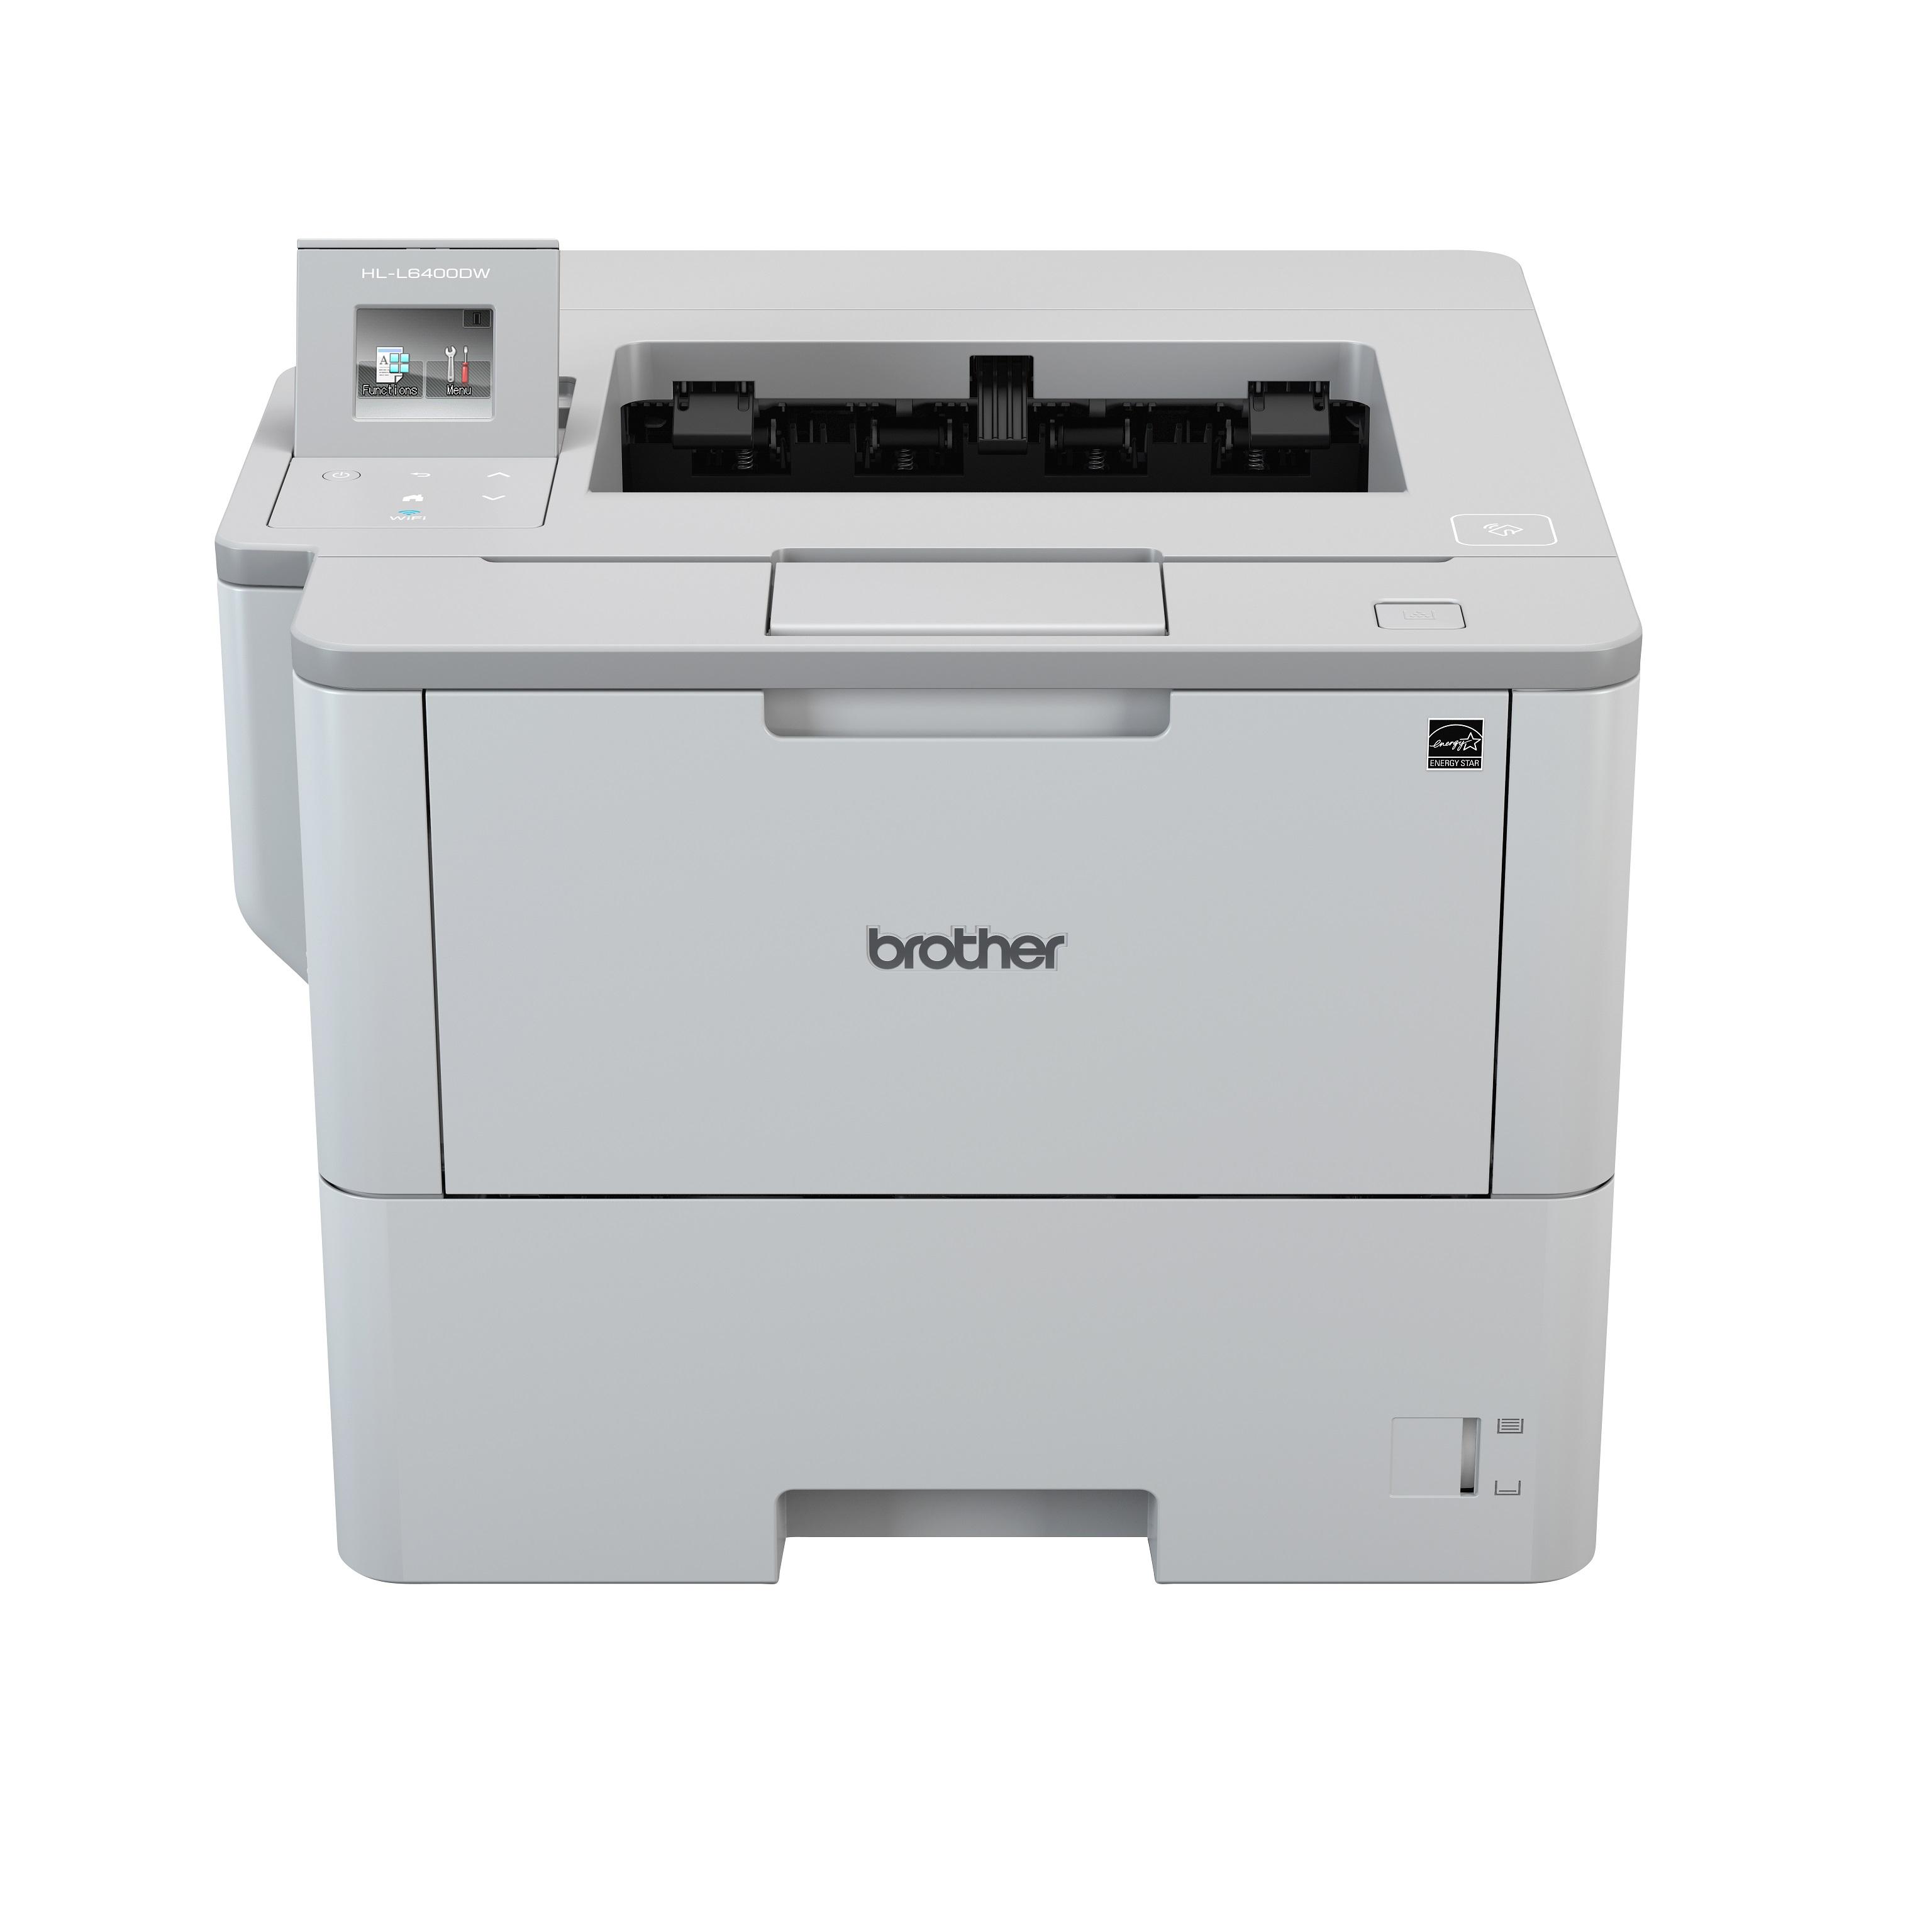 Laser Printers Brother HLL6400DW Mono Laser Printer